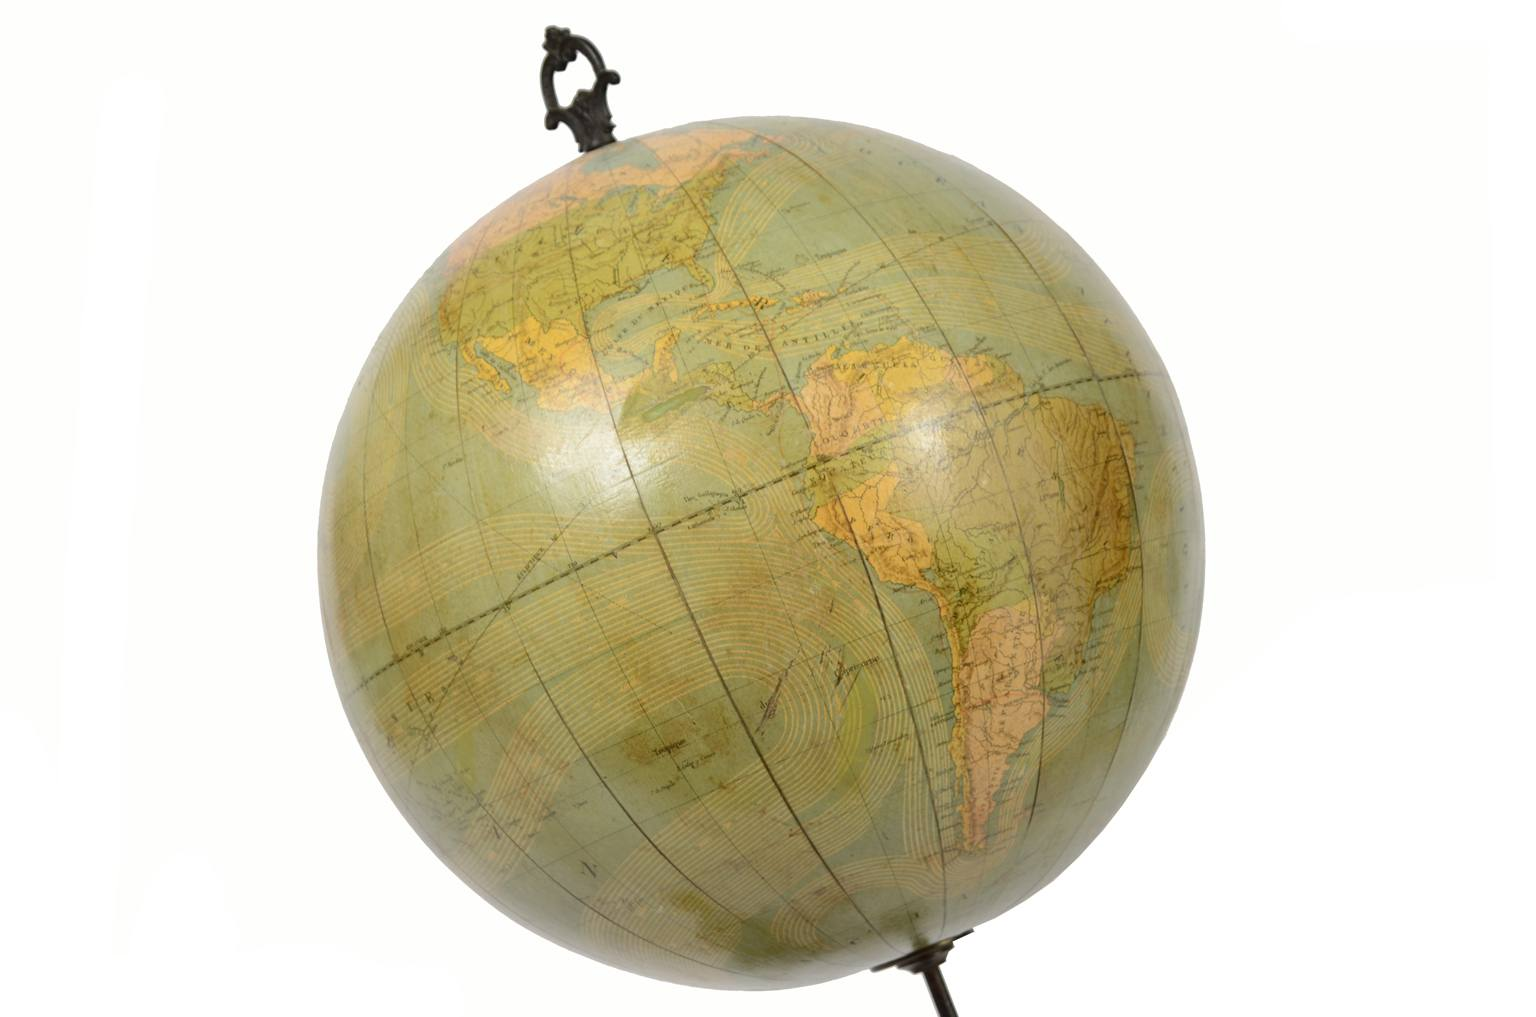 Globi-mappamondi antichi/4137-Globo Girard e Boitte